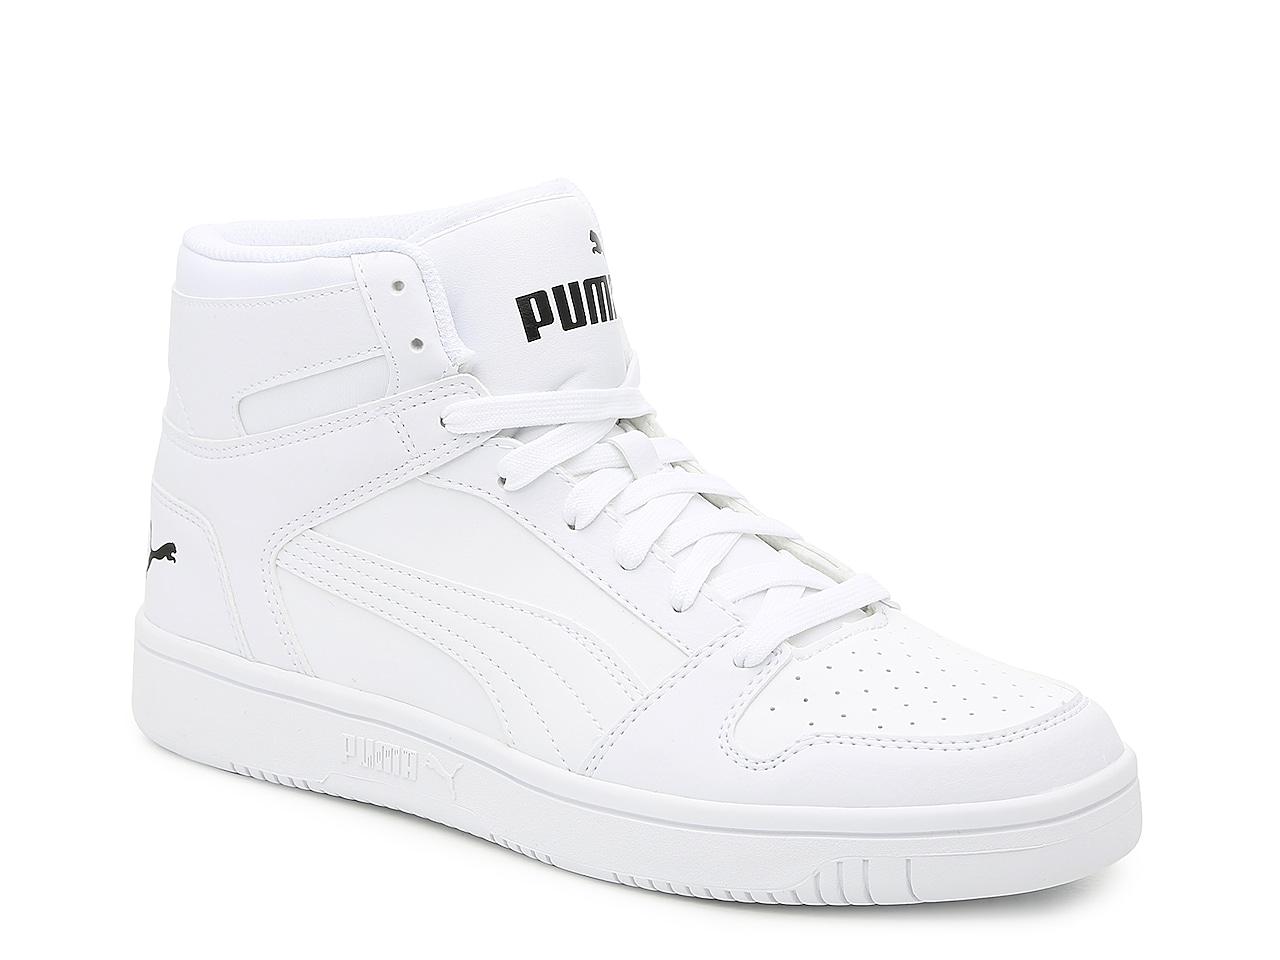 Rebound LayUp SL High-Top Sneaker - Men's